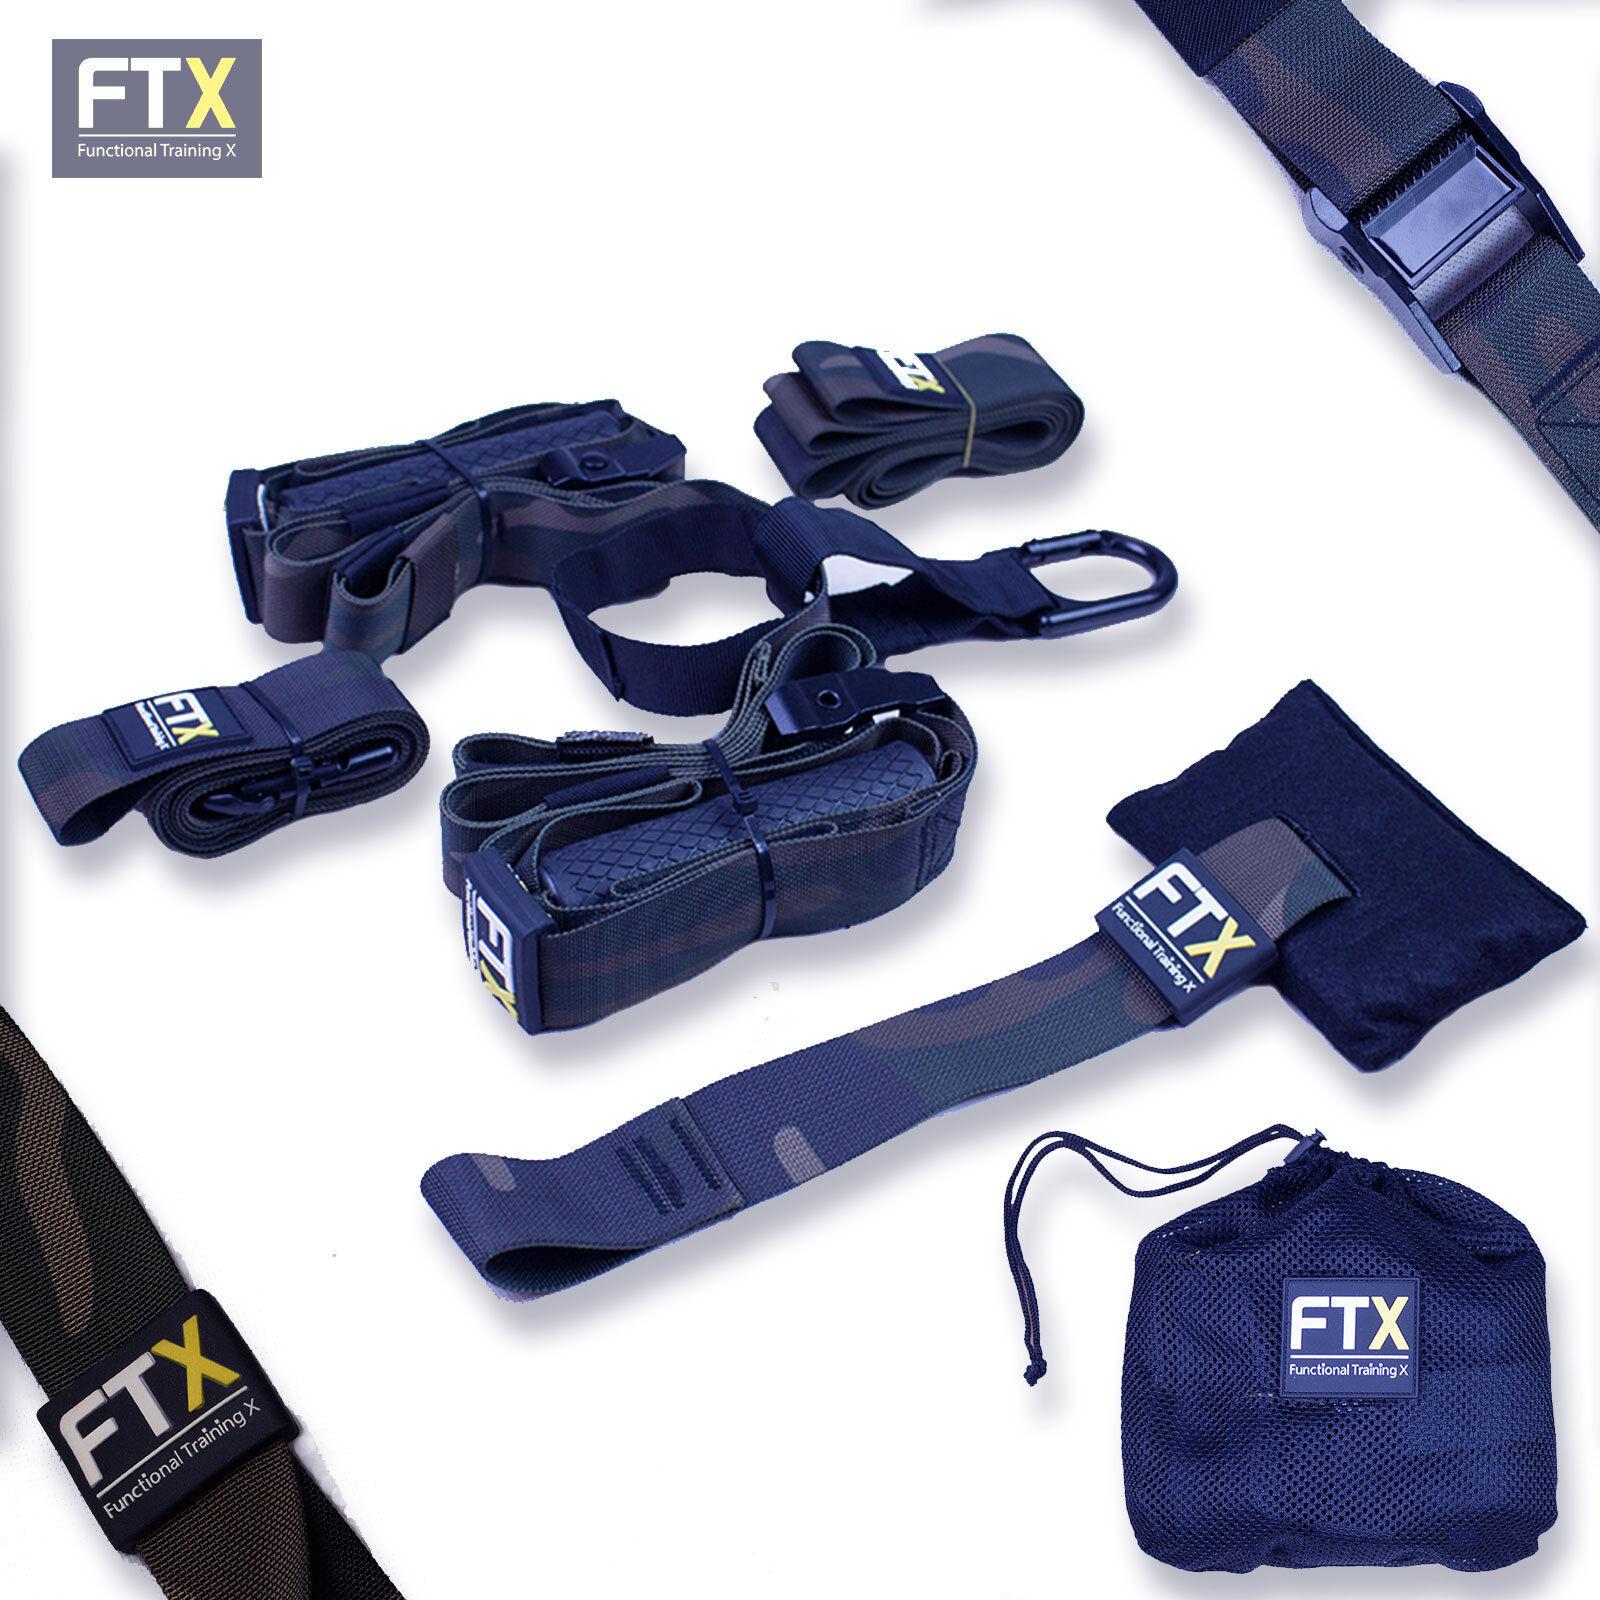 Profi Suspension Trainer/ Schlingentrainer / SlingTraining Pro camouflage FTX-29